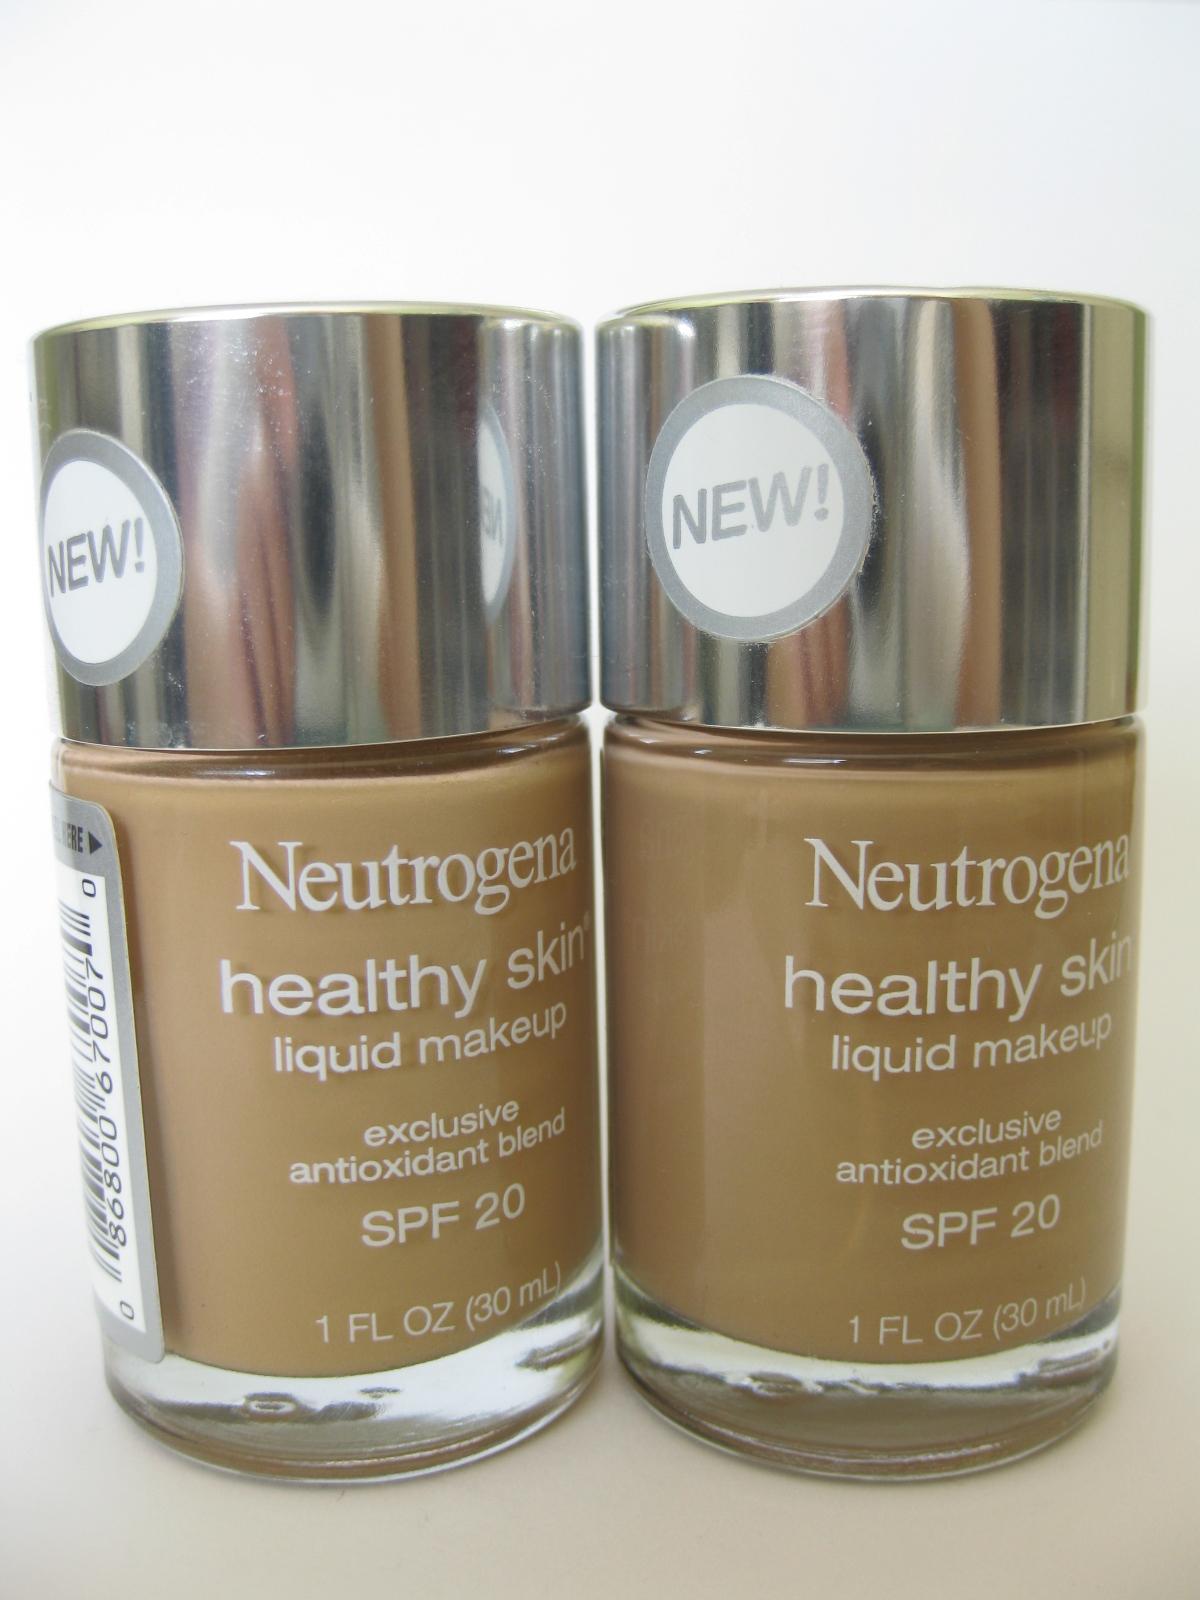 Neutrogena healthy skin liquid makeup shades